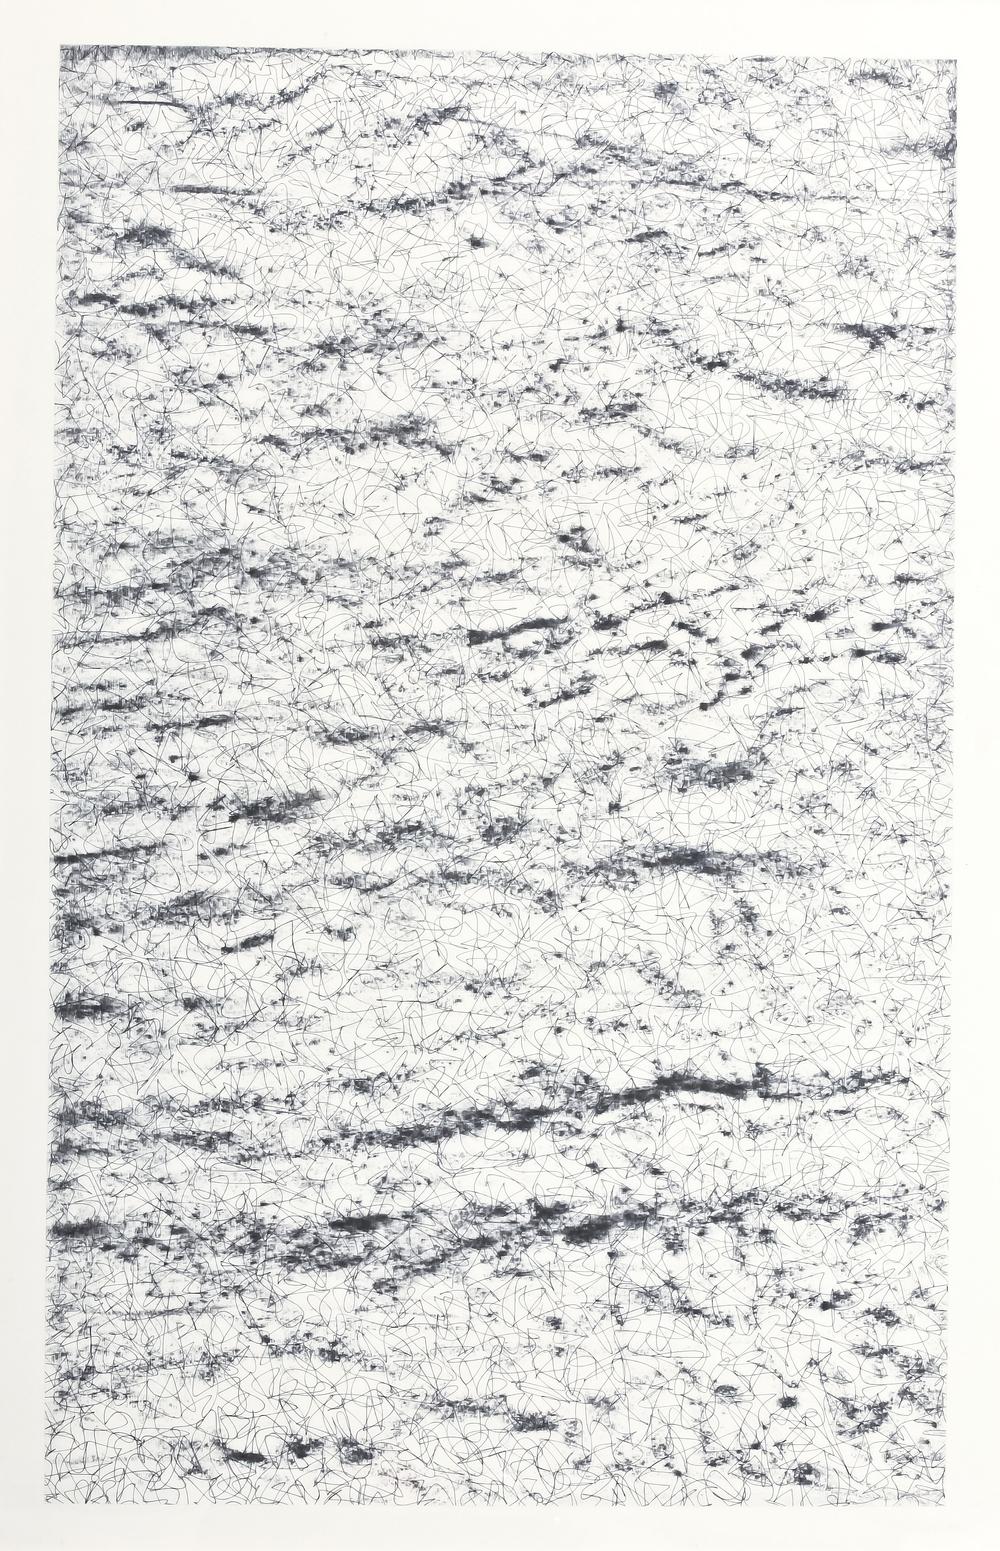 La era del nuevo atleta , 2012 / Charcoal and pen on paper / 100cm x70cm